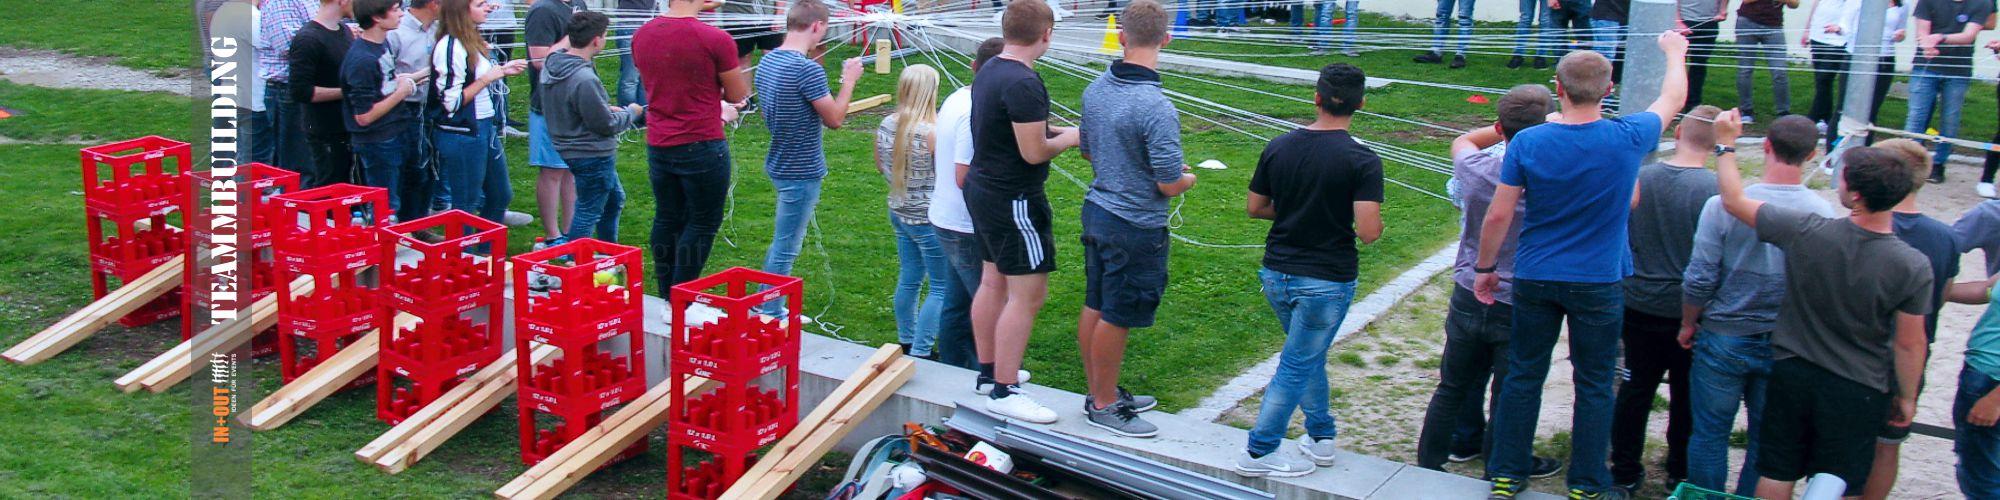 Ideen für Team Events - Azubi Camp - Team Event Köln